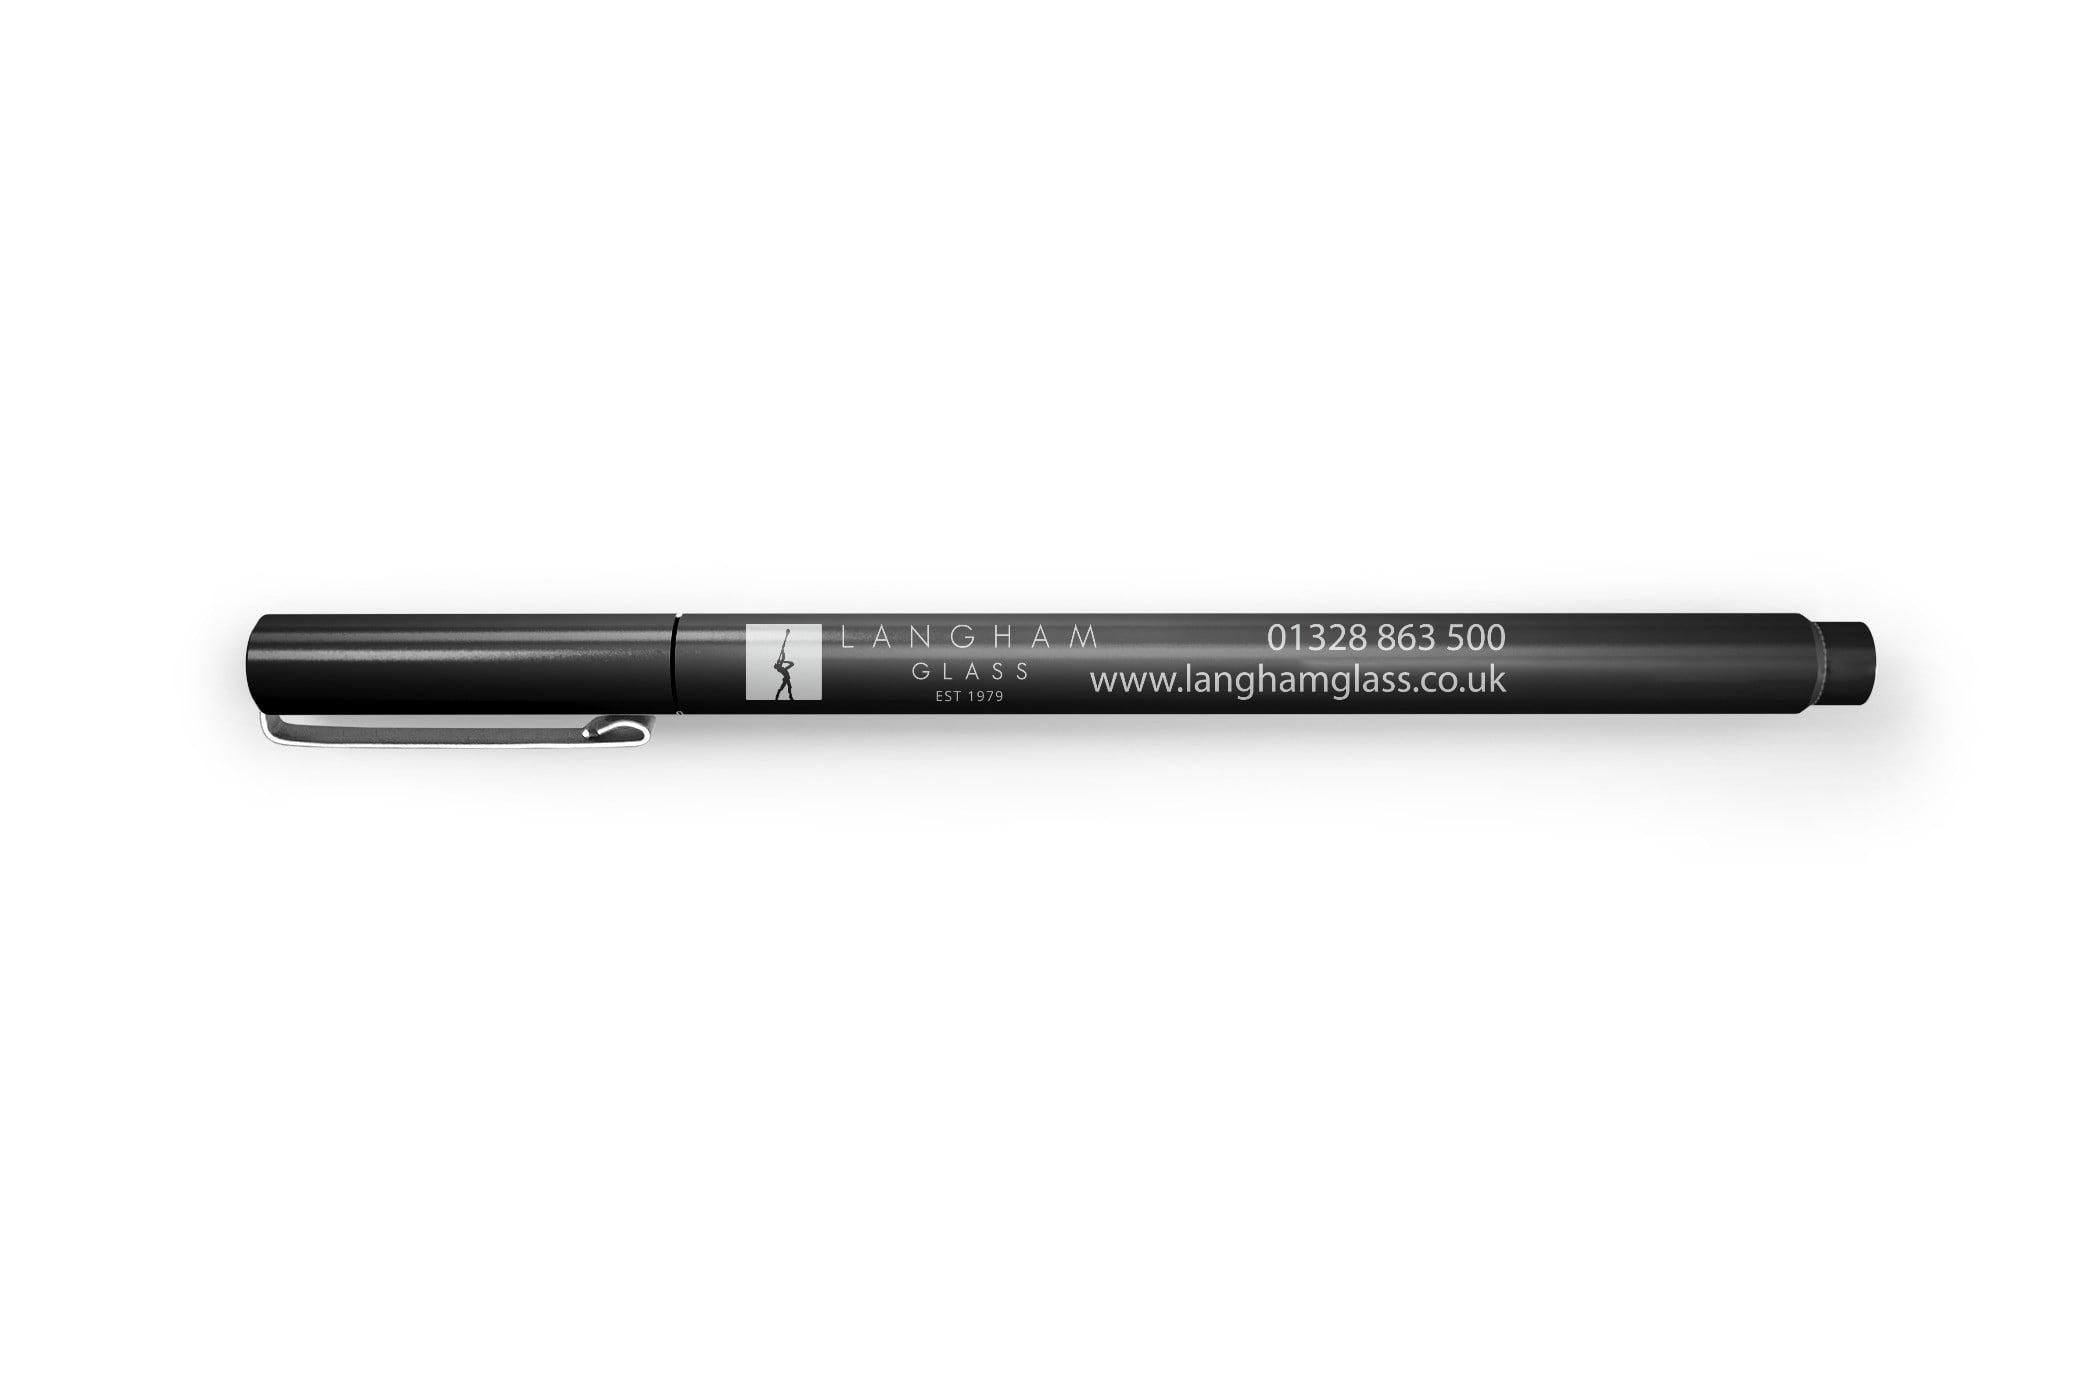 steele media langham glass pen